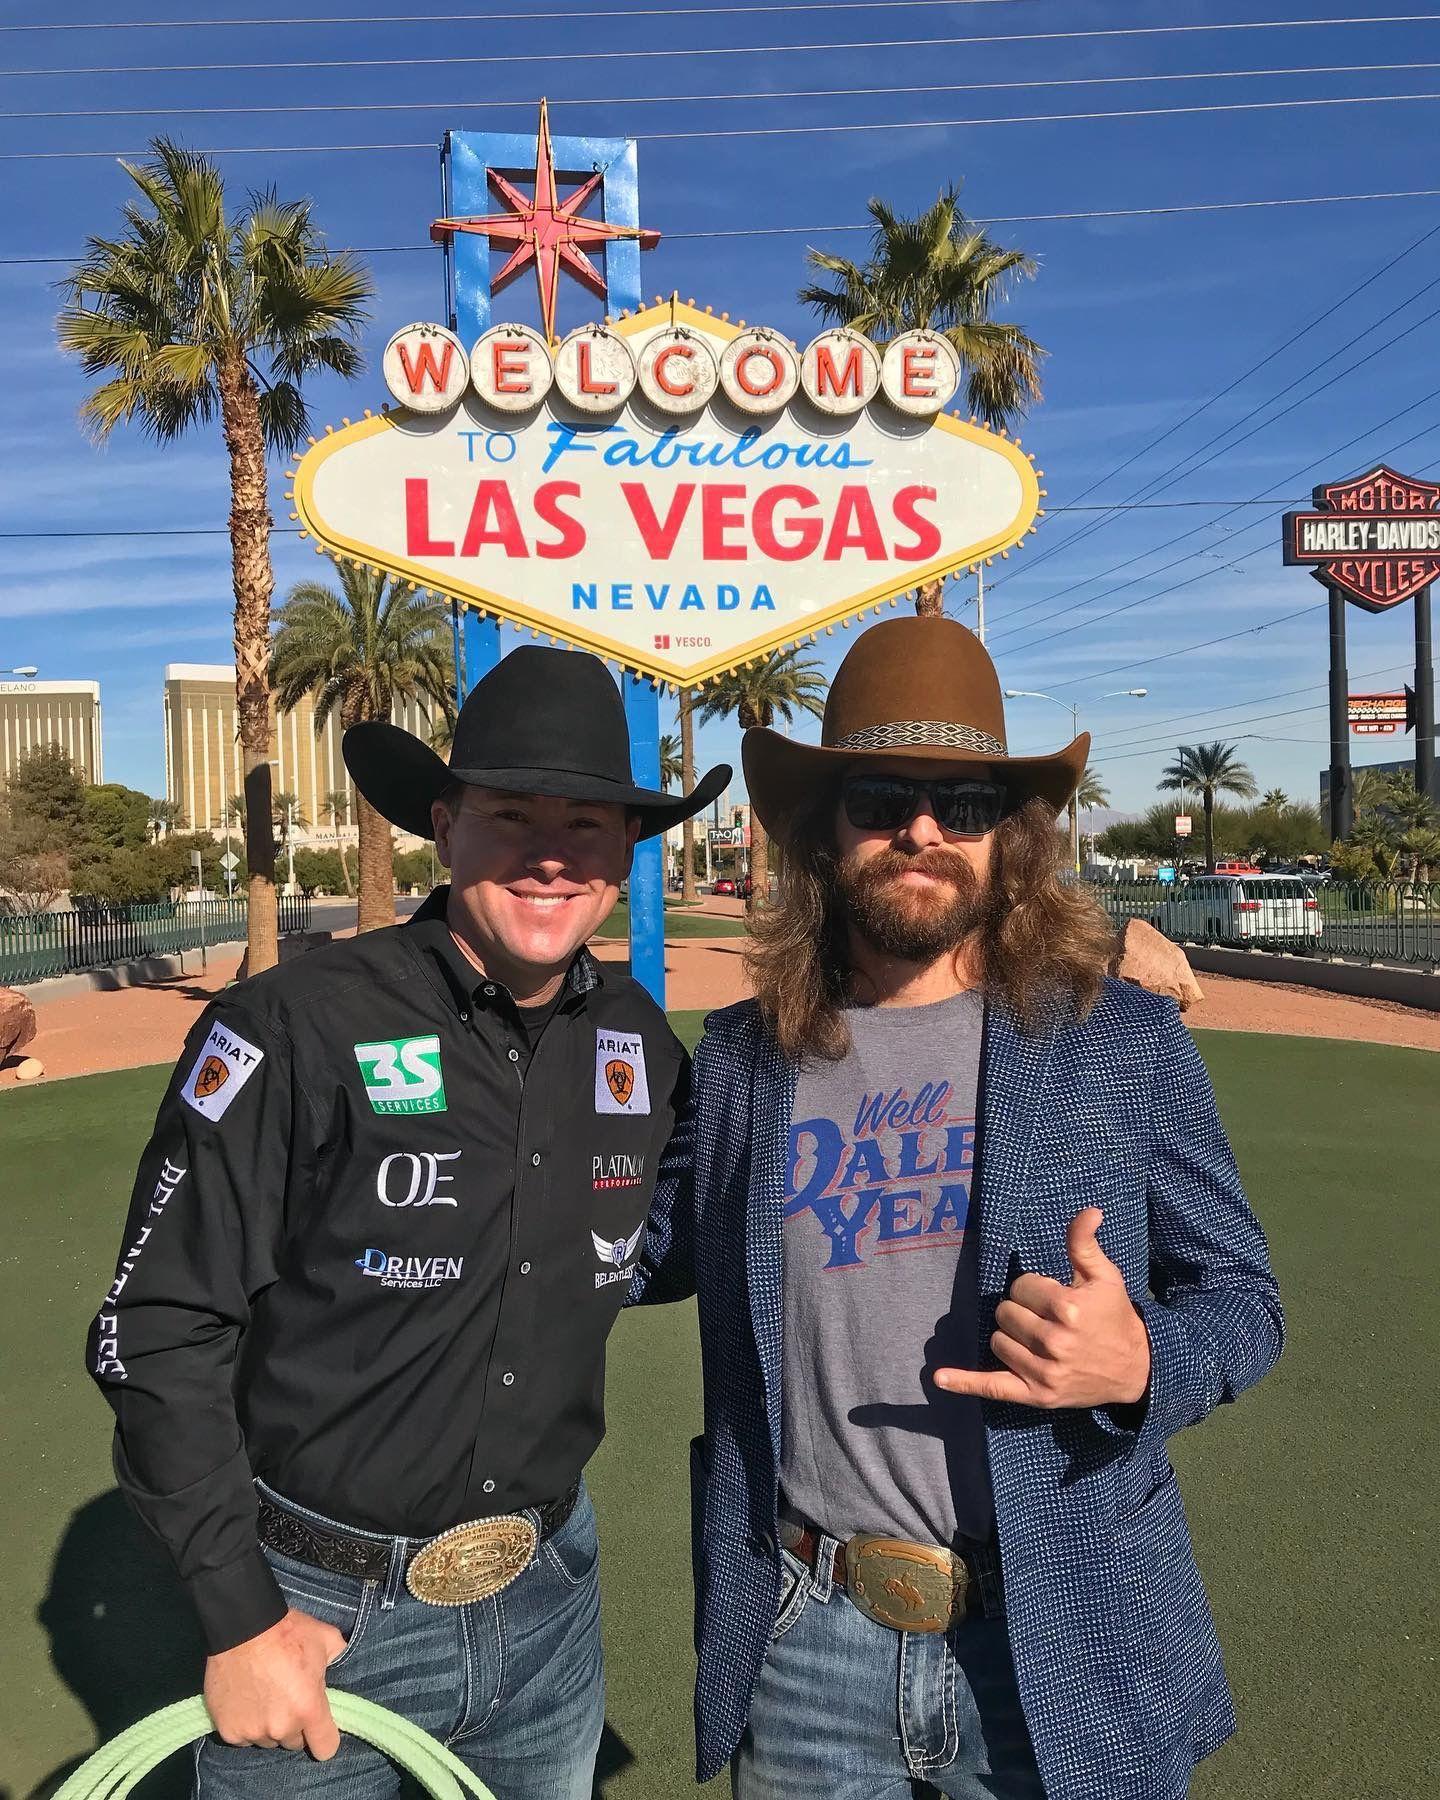 Pin by Rowdy on Cowboys Harley david, Harley, Hotties